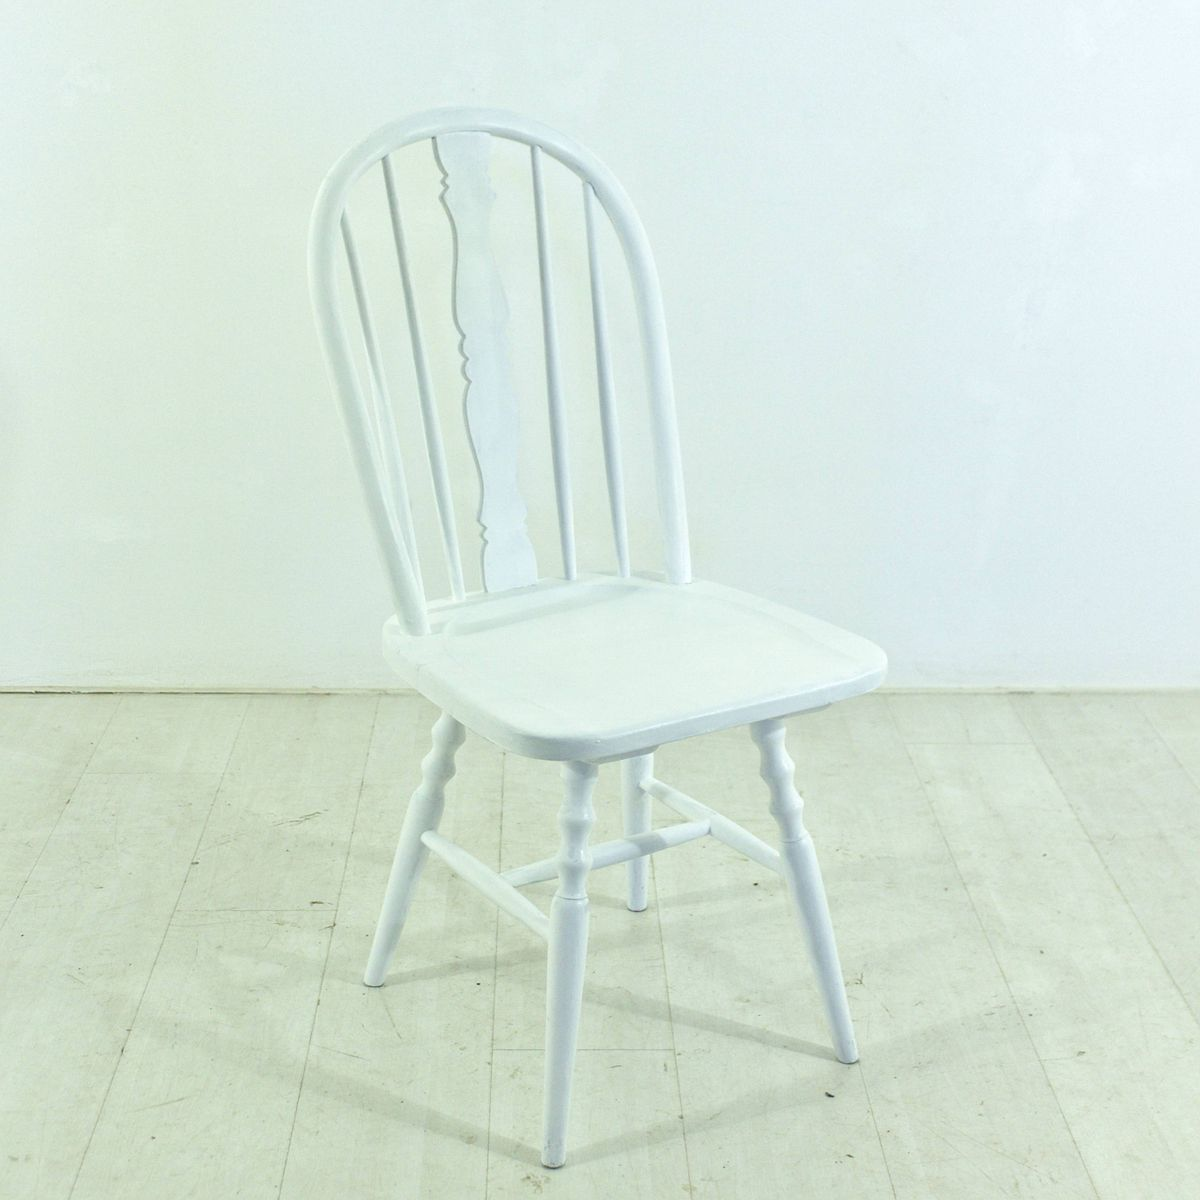 windsor st hle aus wei er buche 4er set bei pamono kaufen. Black Bedroom Furniture Sets. Home Design Ideas